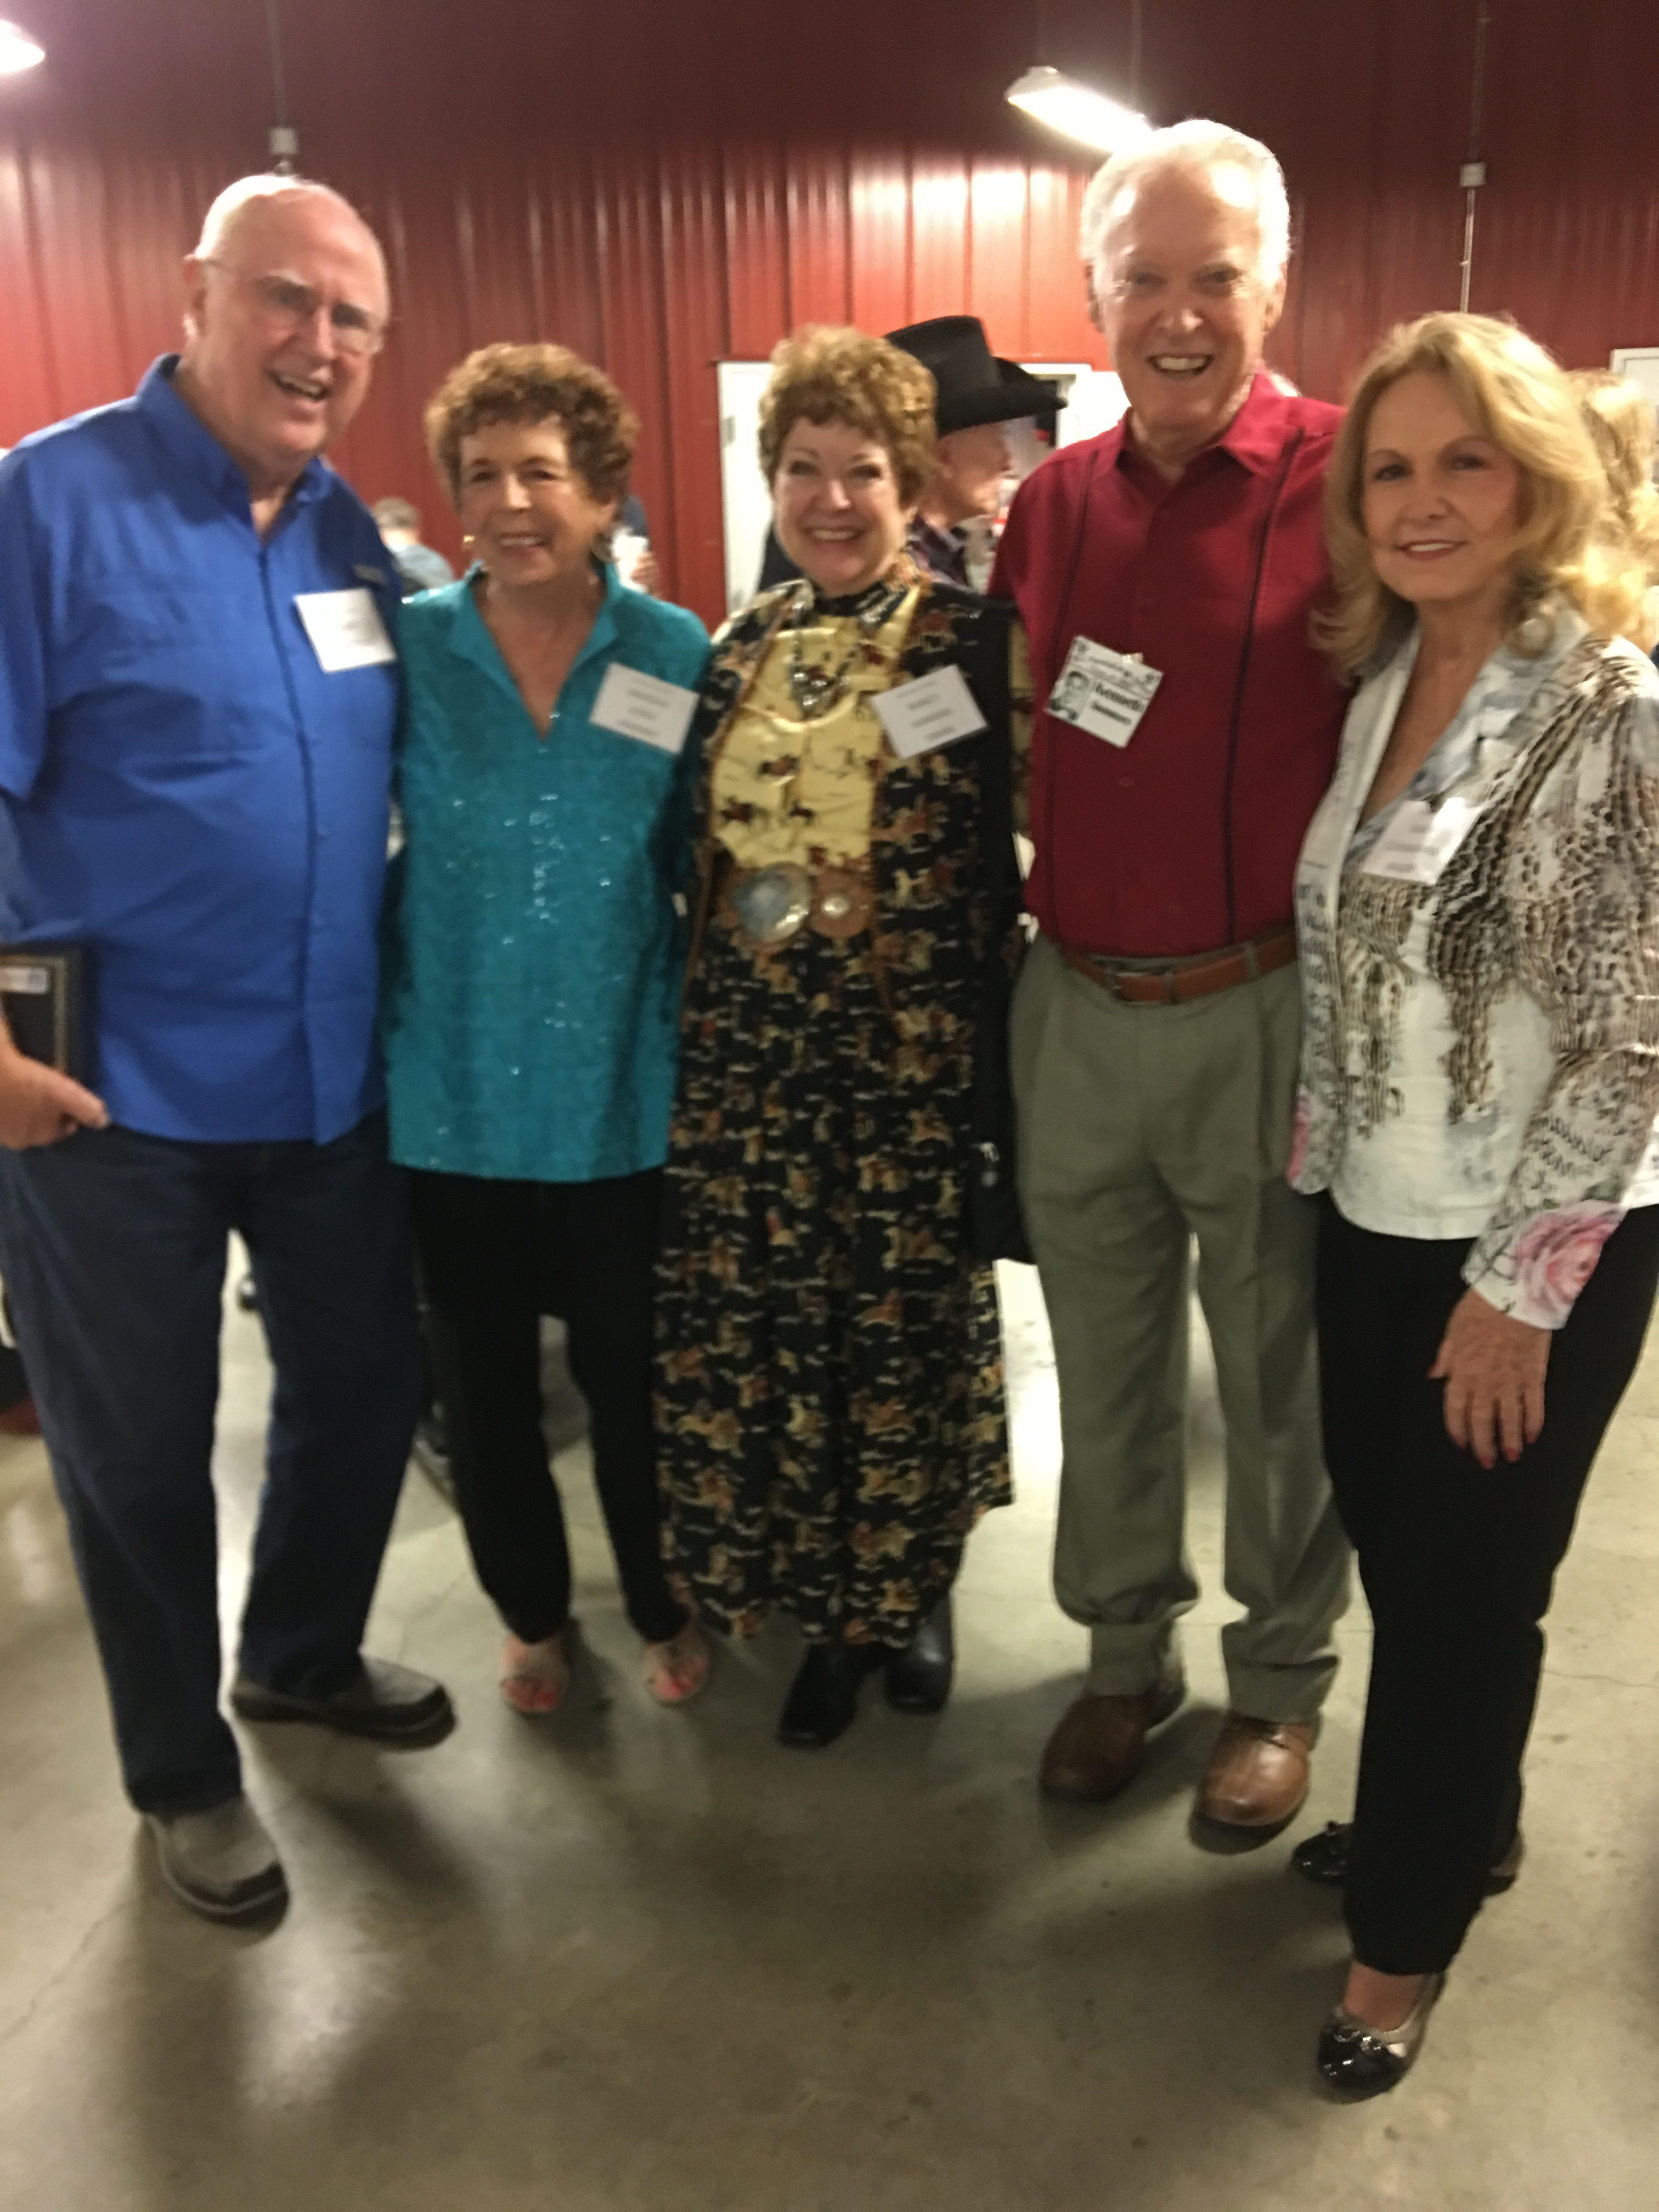 Jimmy Patterson, Marsha Essex Marino, Nancy Hankins Swan, Kenneth Summers, Wanda Cunningham Walker